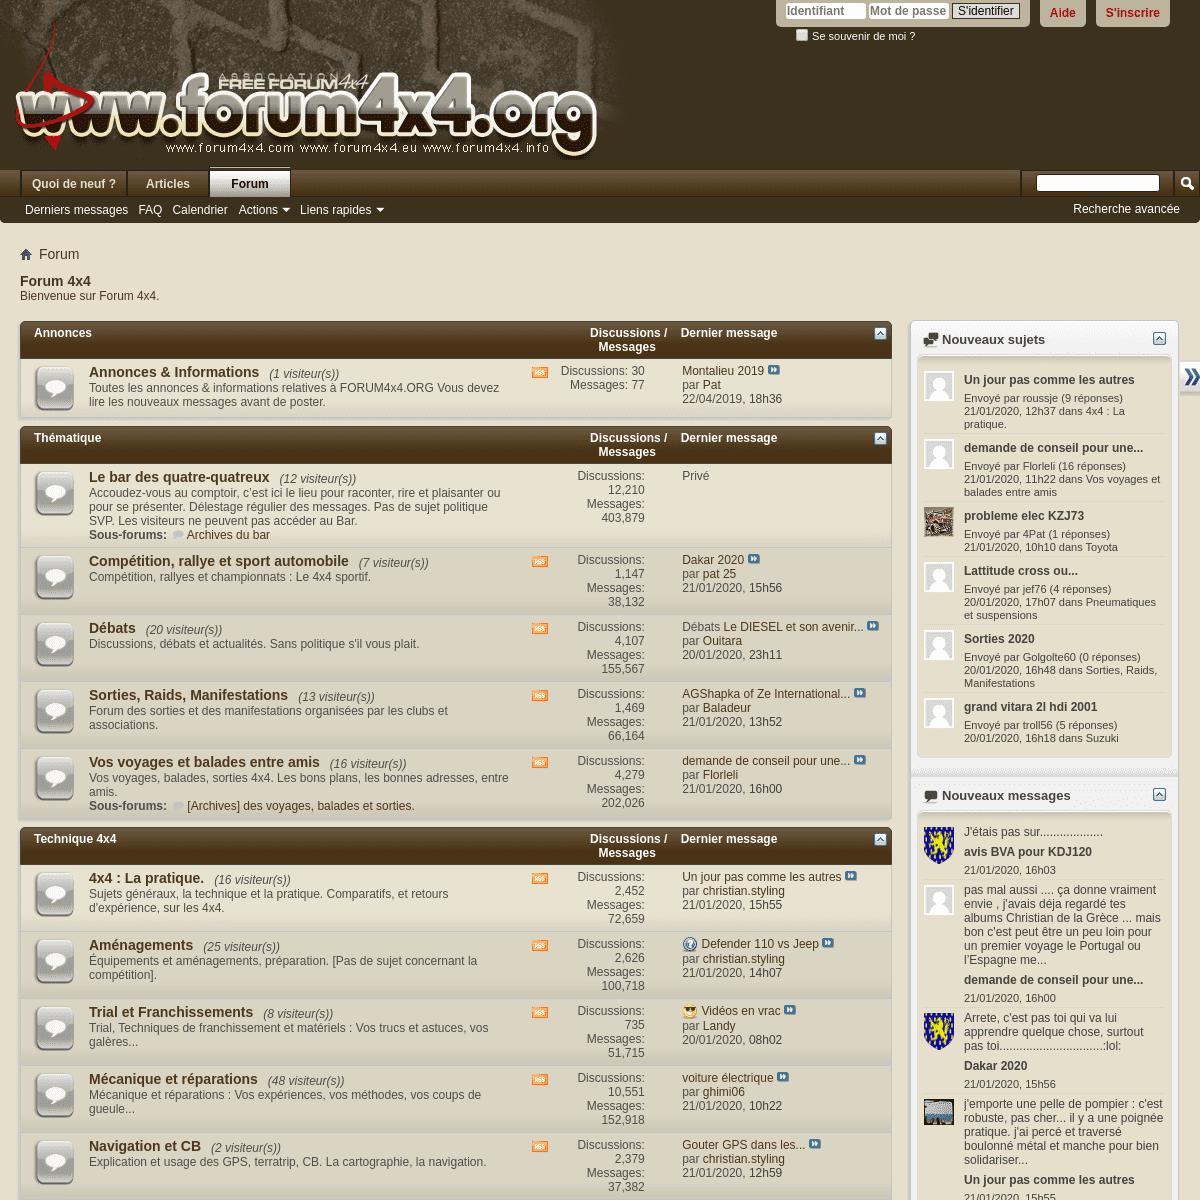 ArchiveBay.com - forum4x4.org - Forum 4x4